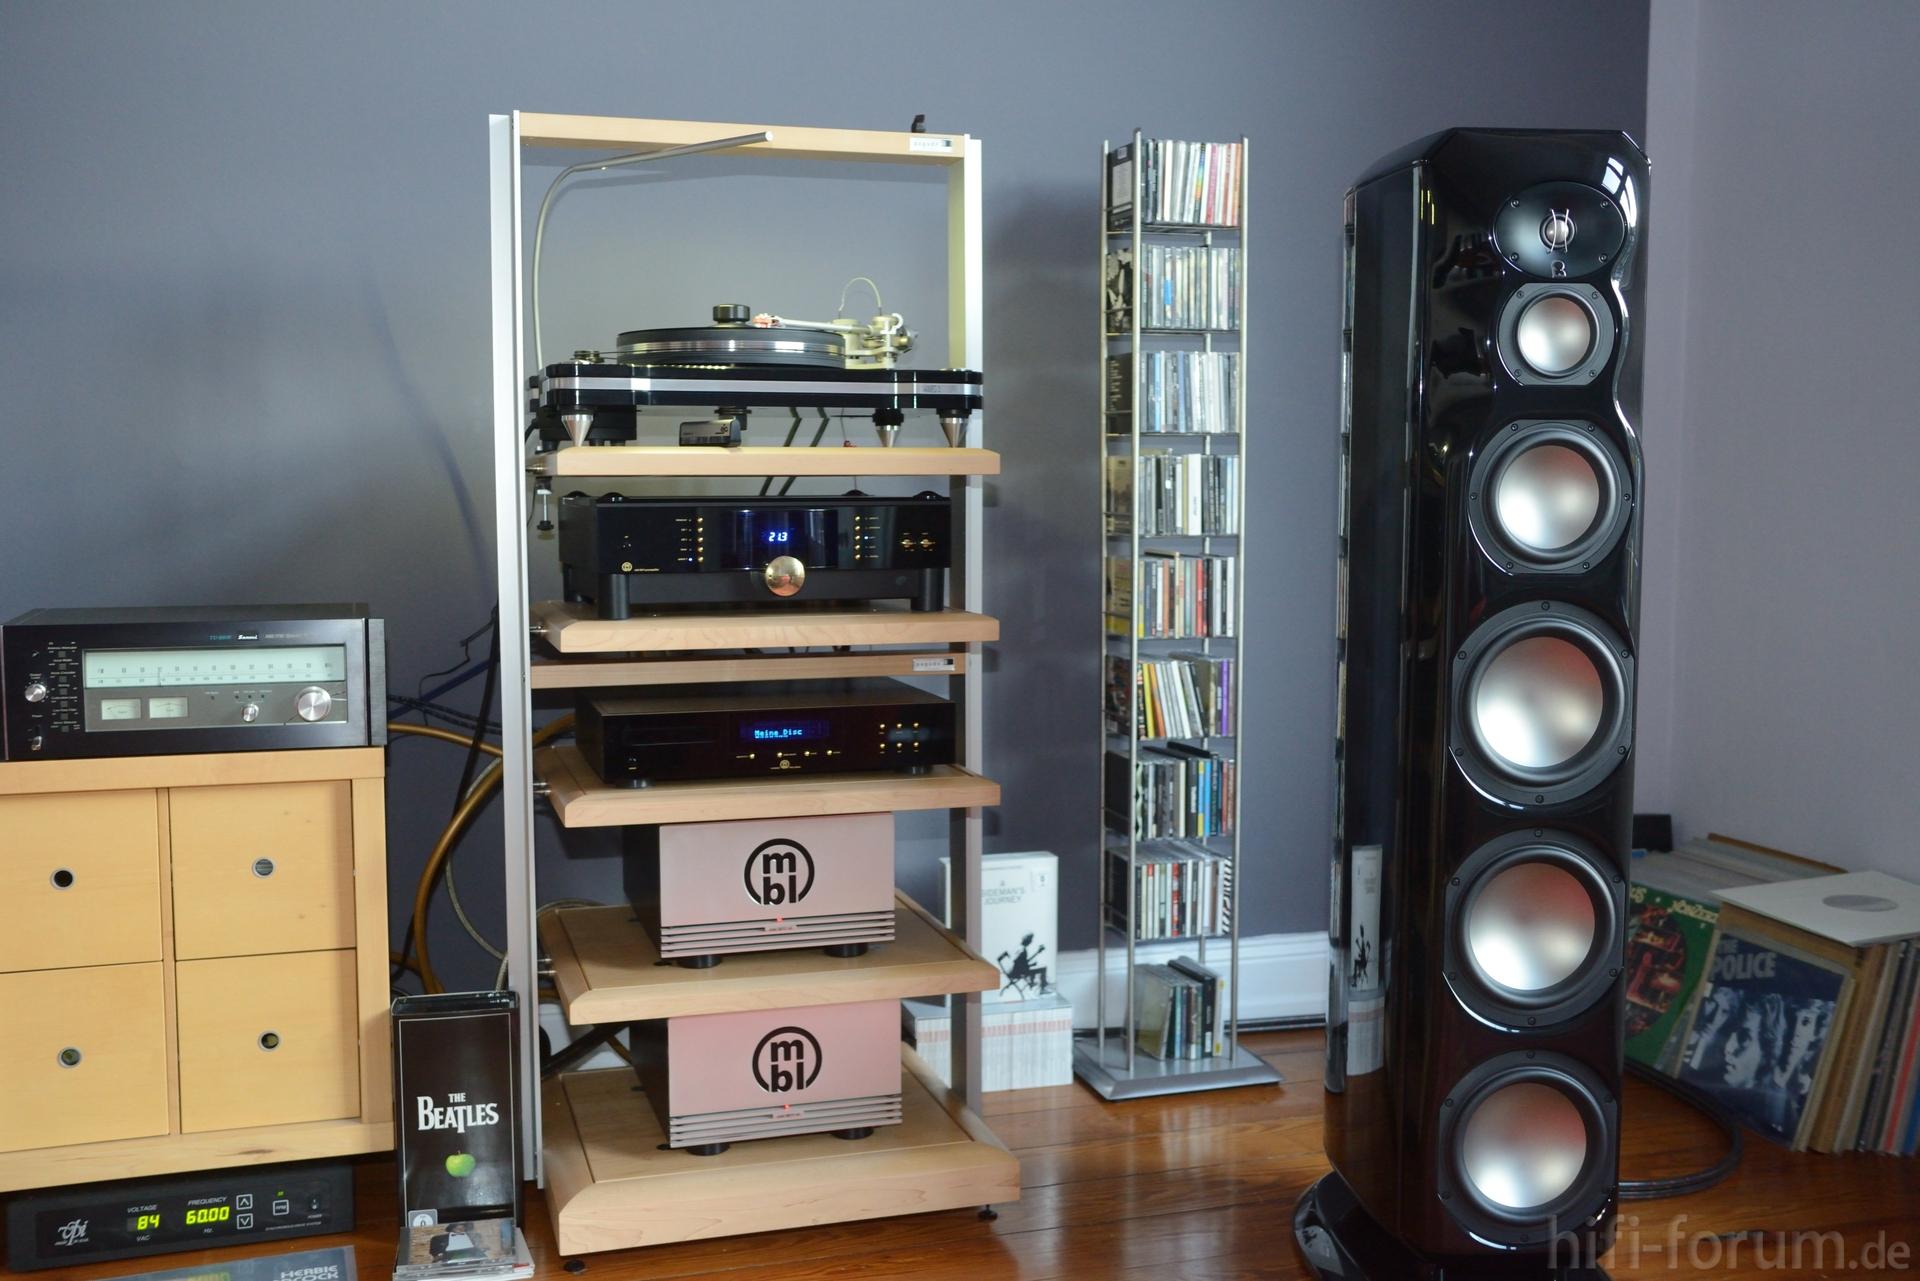 anlage boxen anlage boxen mbl revel sansui vpi hifi bildergalerie. Black Bedroom Furniture Sets. Home Design Ideas